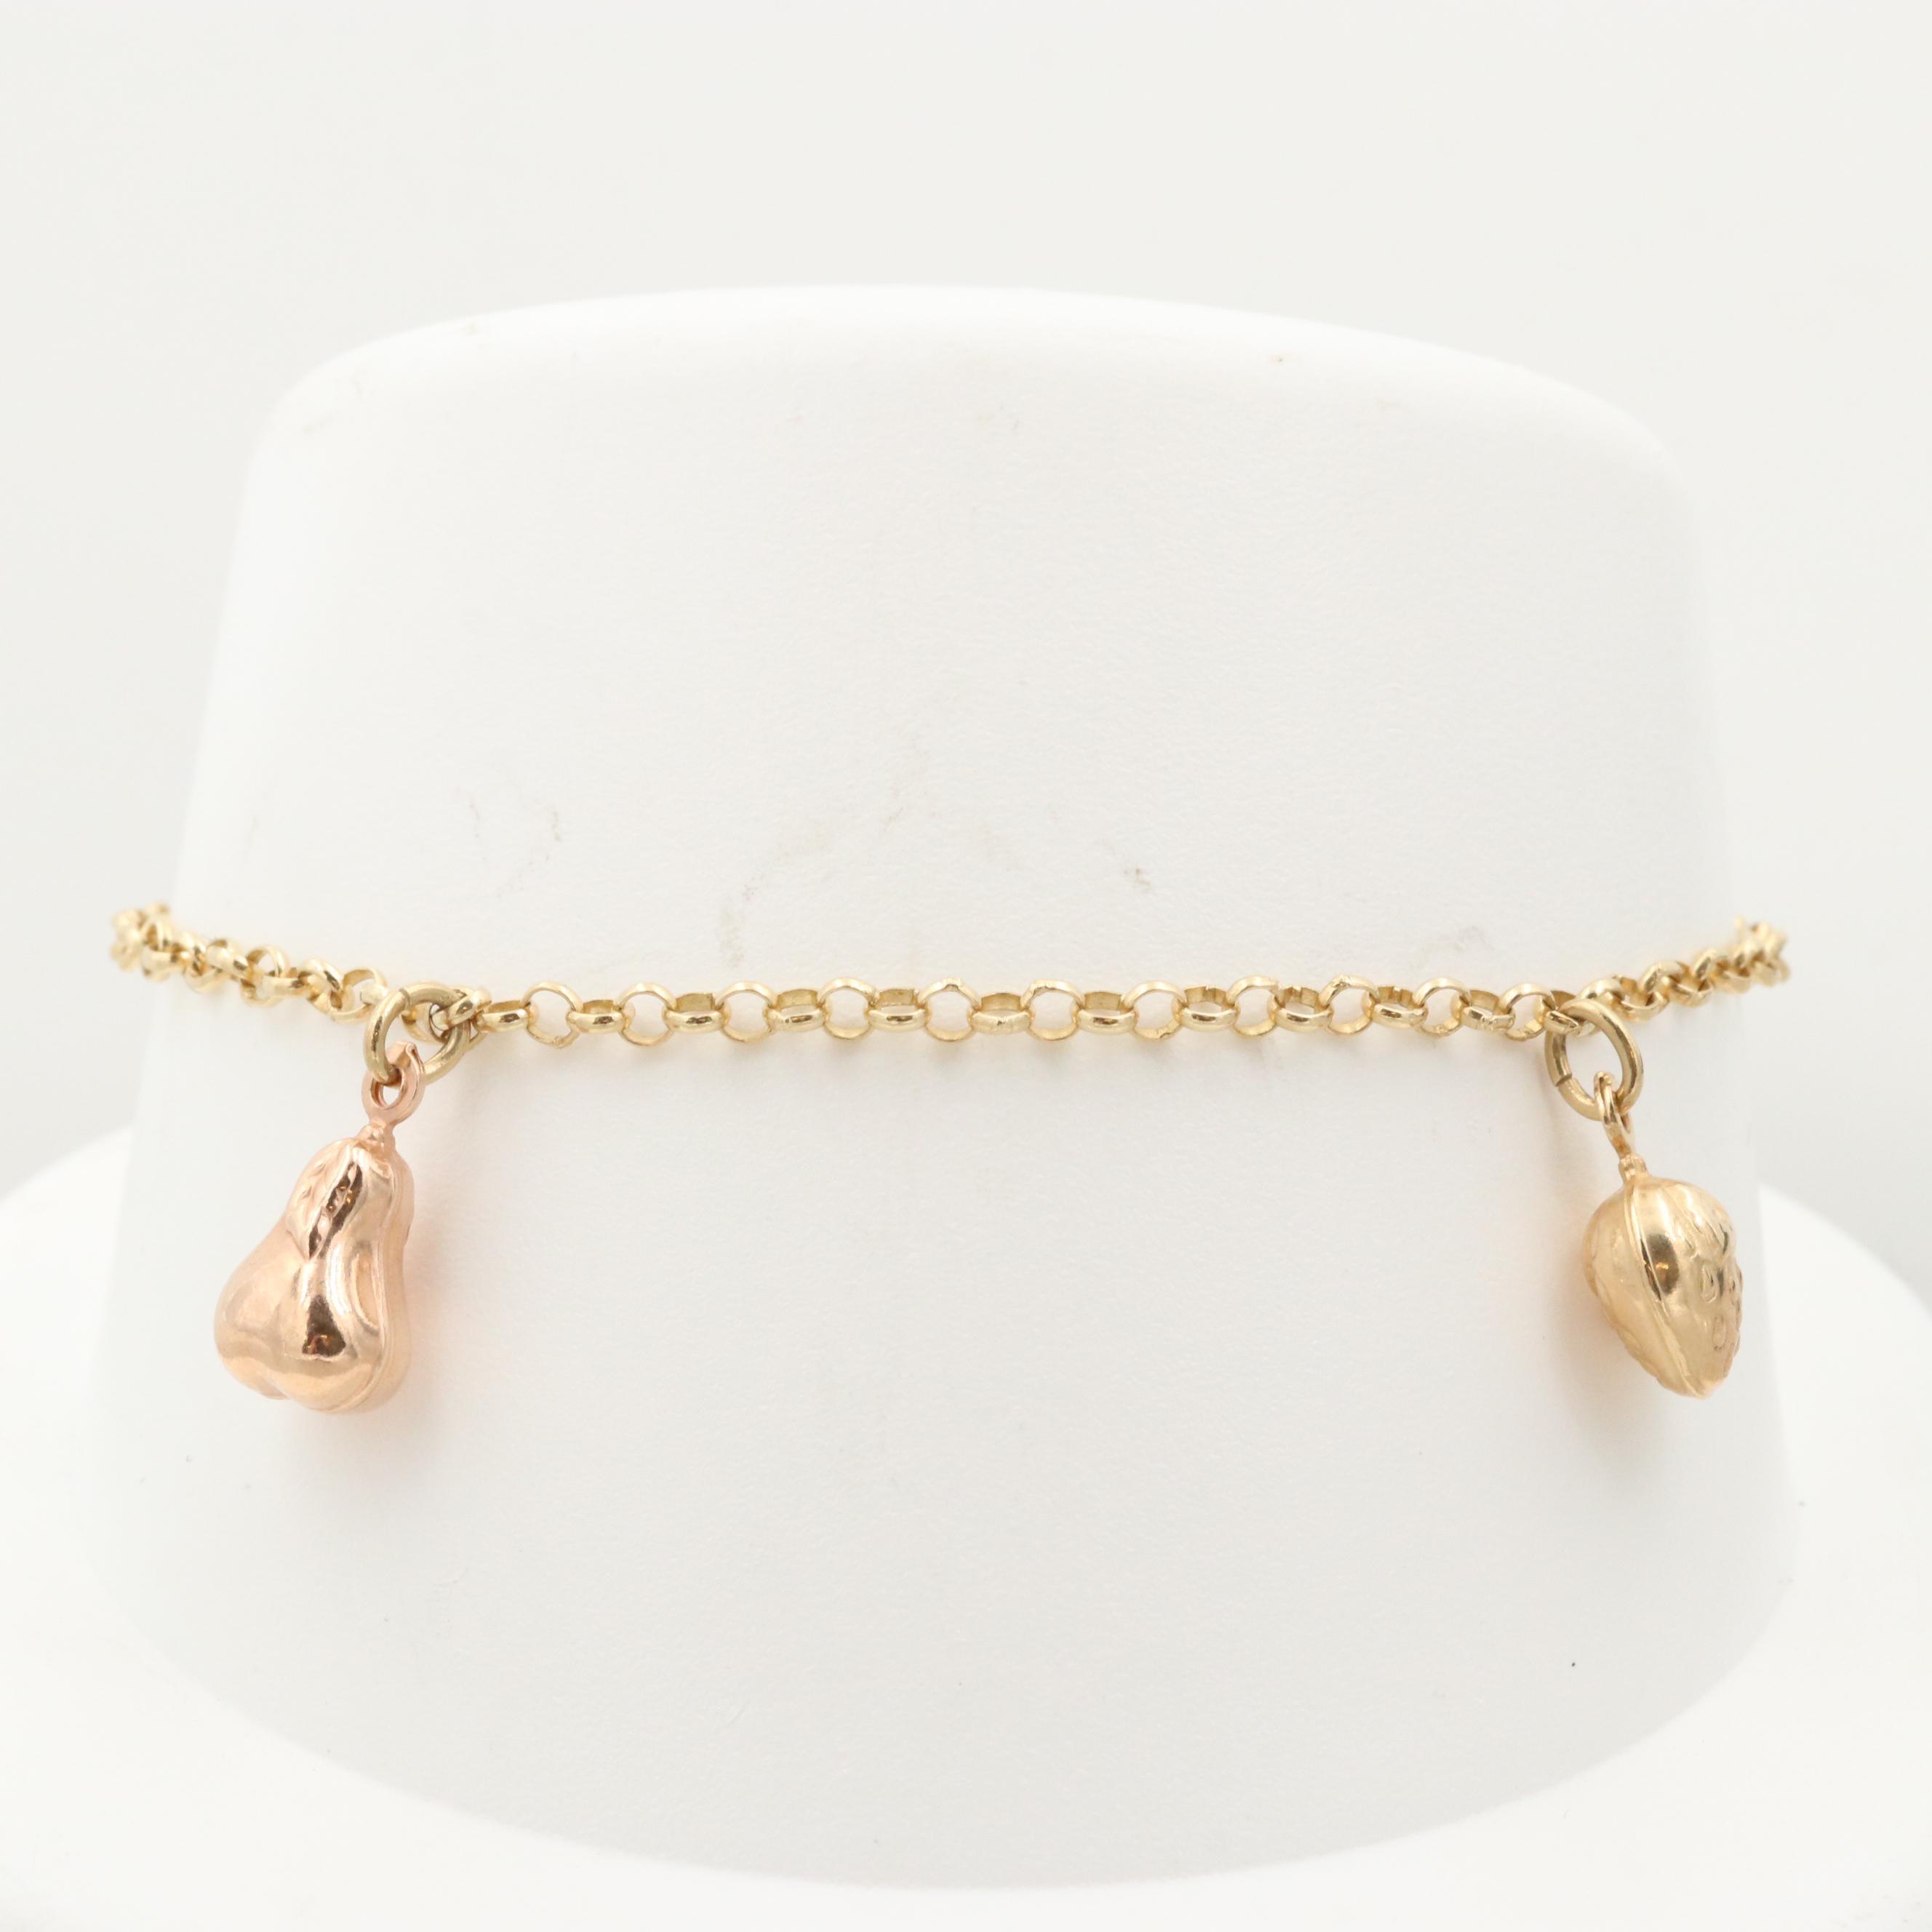 14K Yellow Gold Charm Ankle Bracelet